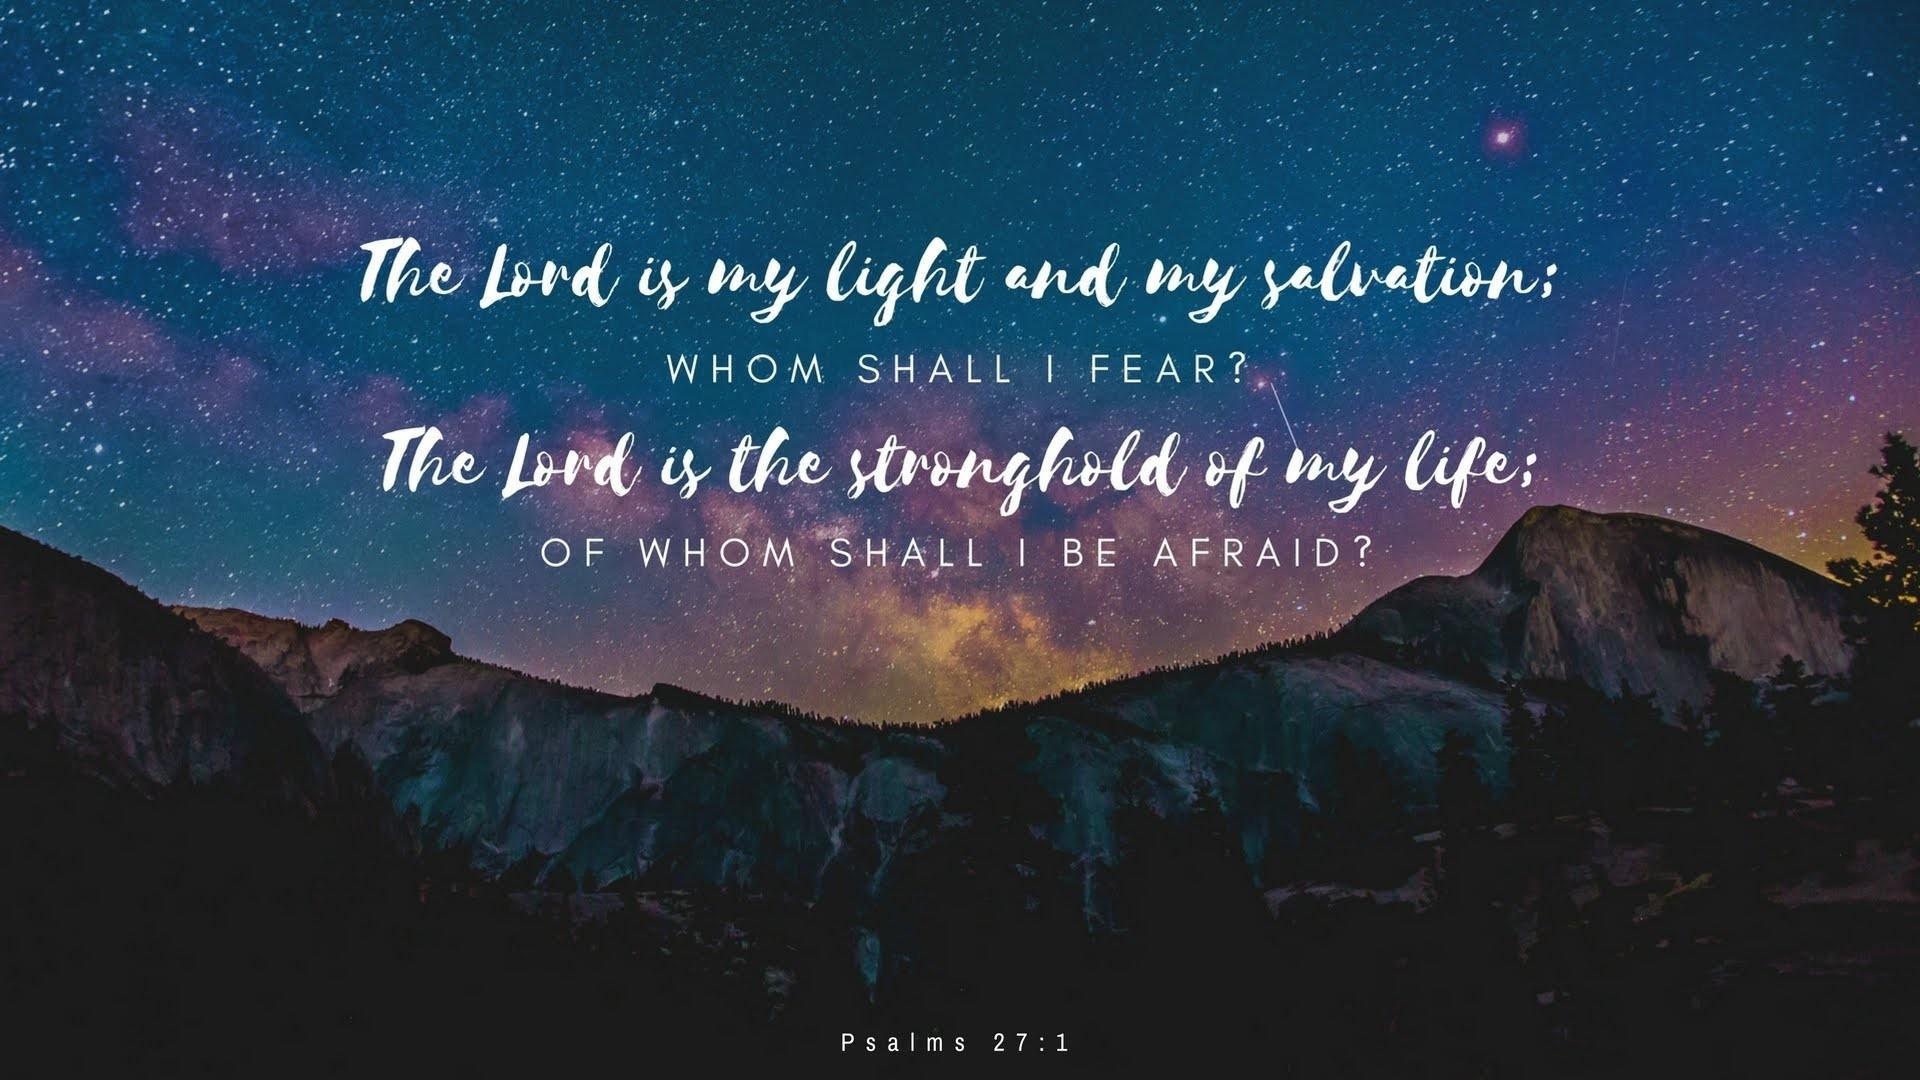 10 best inspirational bible verses wallpaper full hd 1080p for pc desktop 2019 free download - Full hd bible wallpapers ...